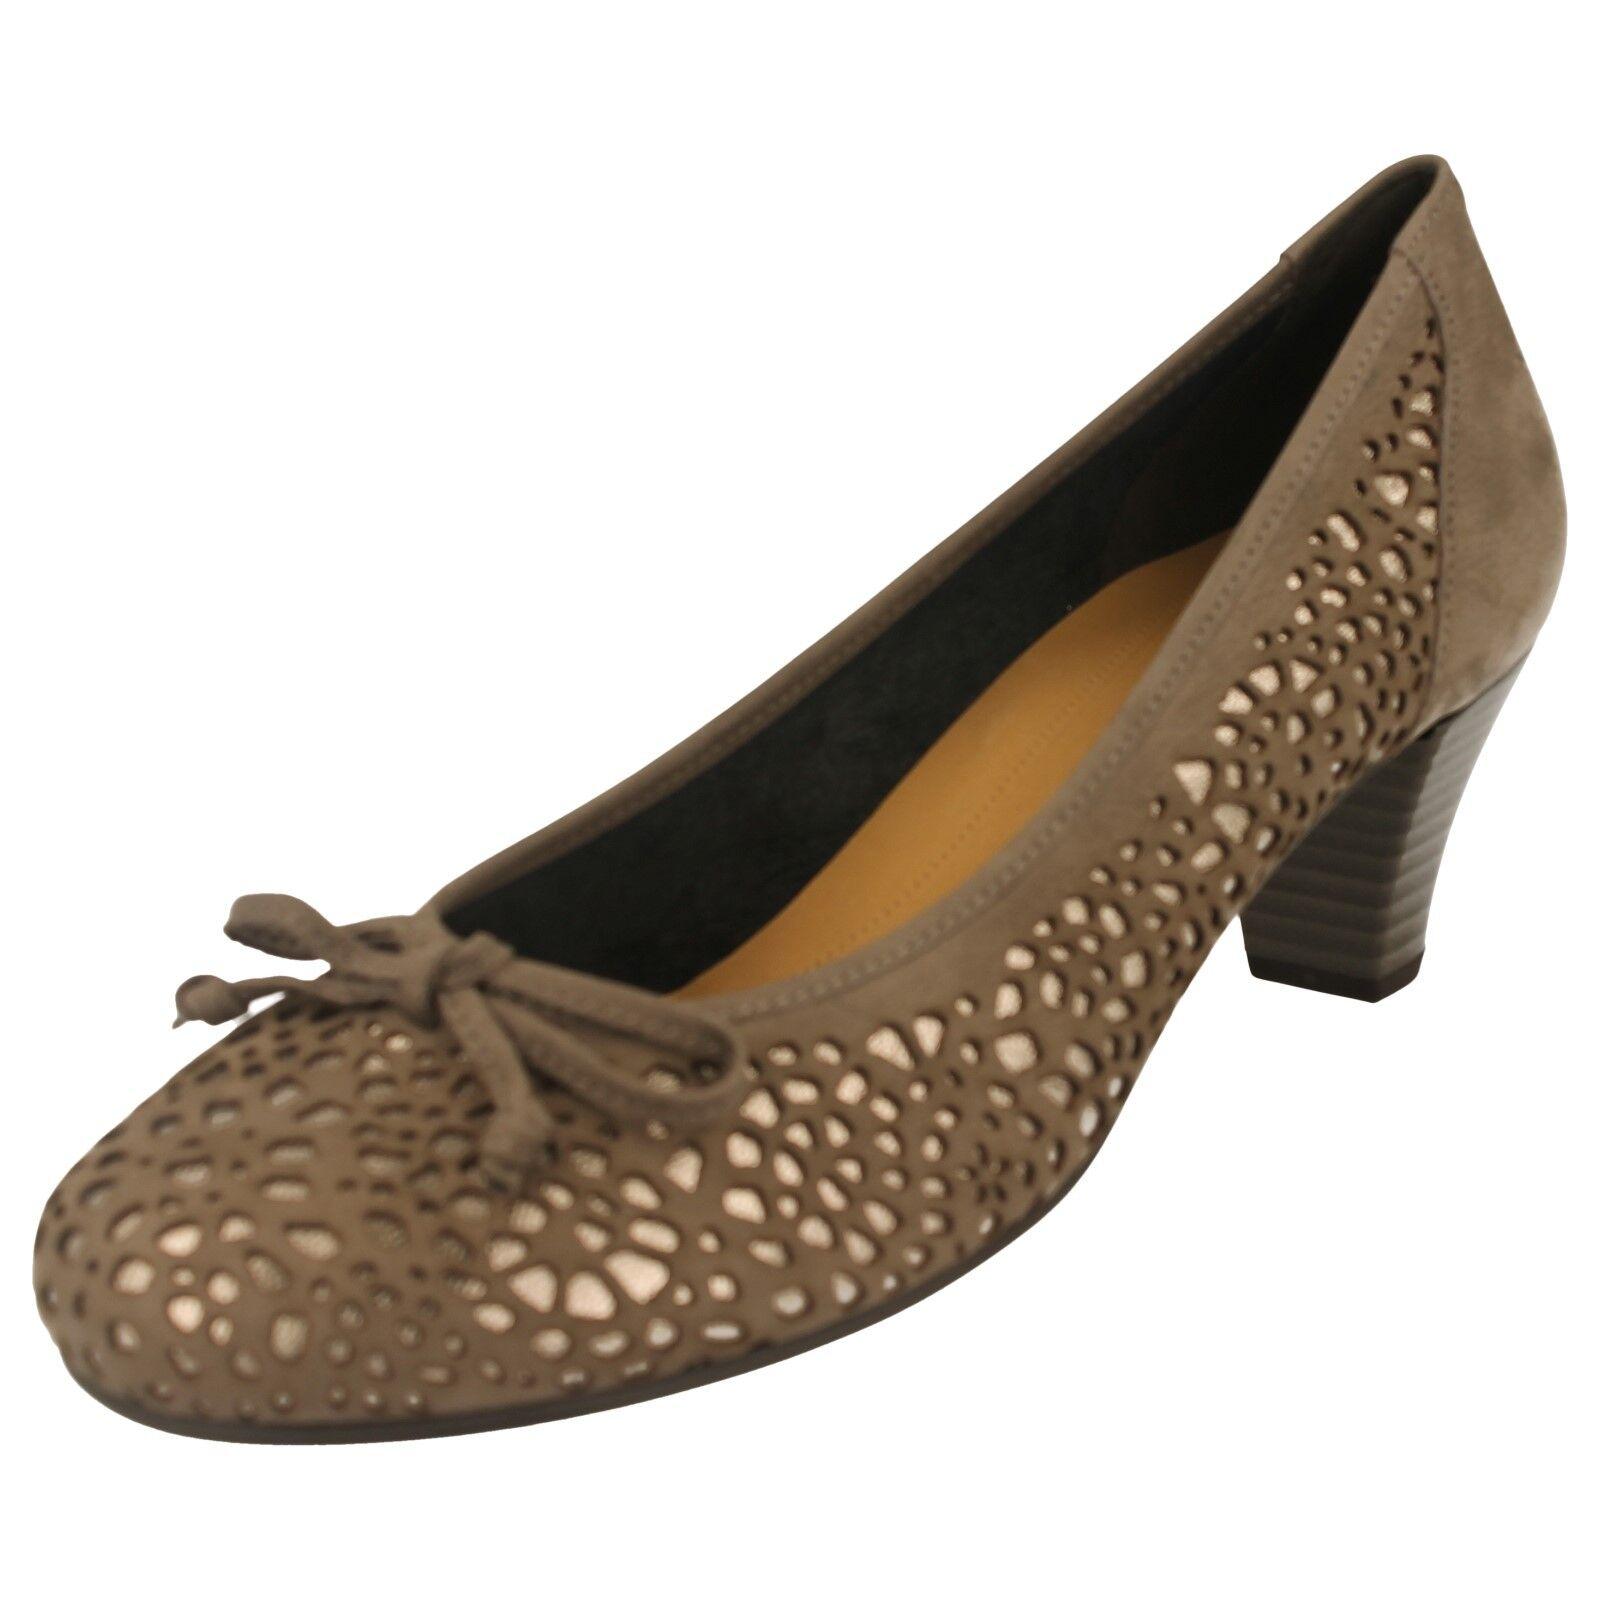 Mesdames GABOR style 25.483.13 colour-fumo   Sibler chaussure de cour